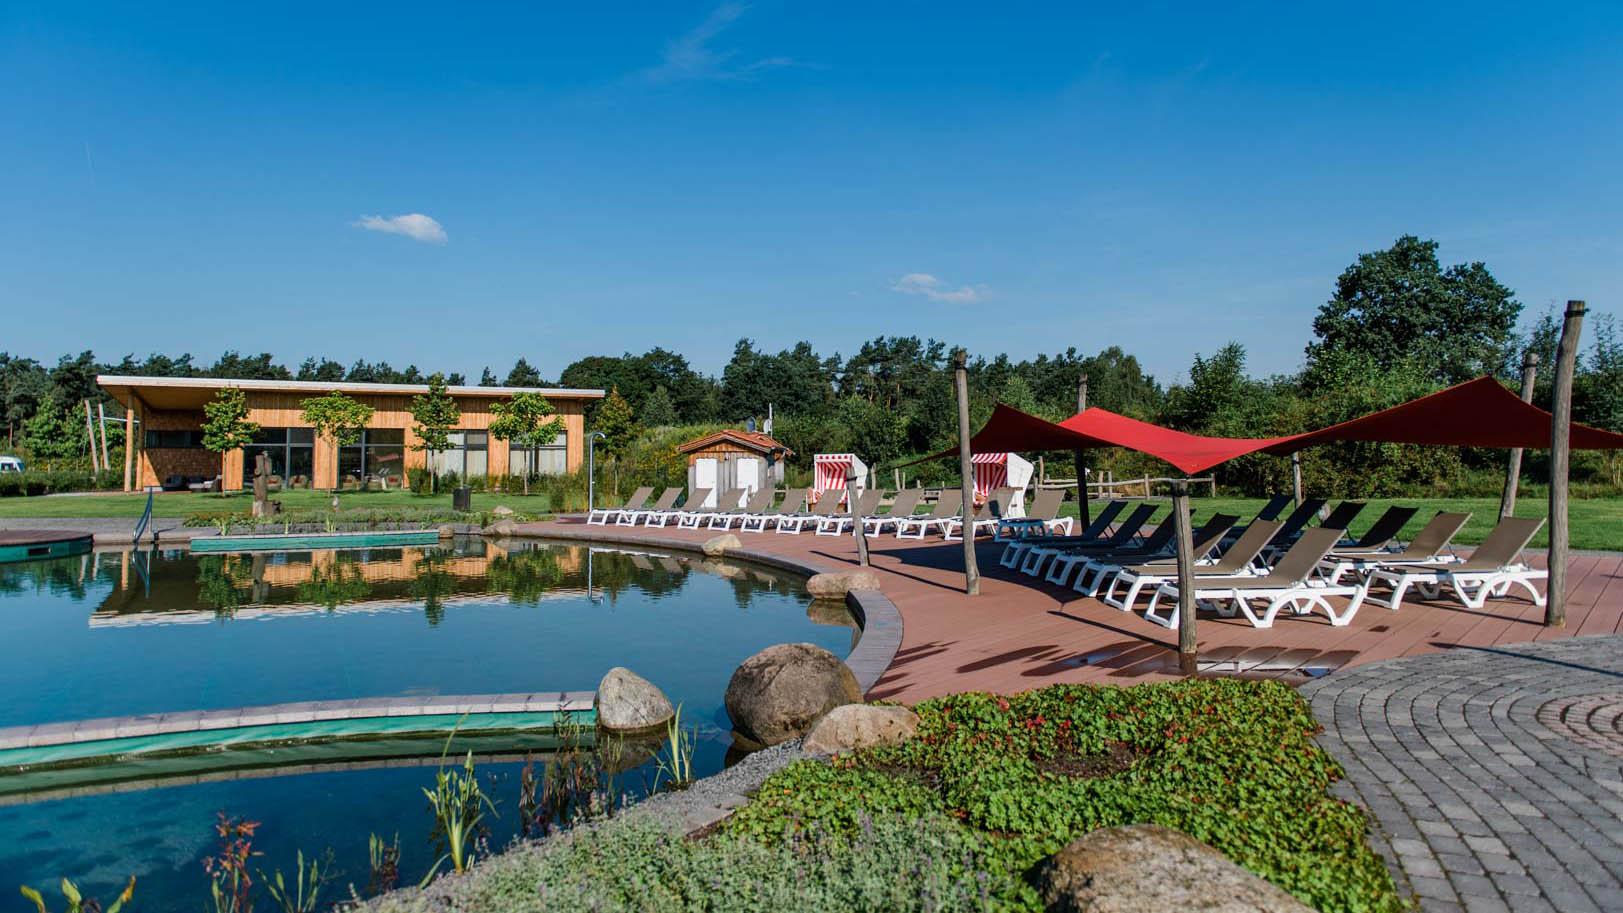 Campingpark Südheide, Naturschwimmteich